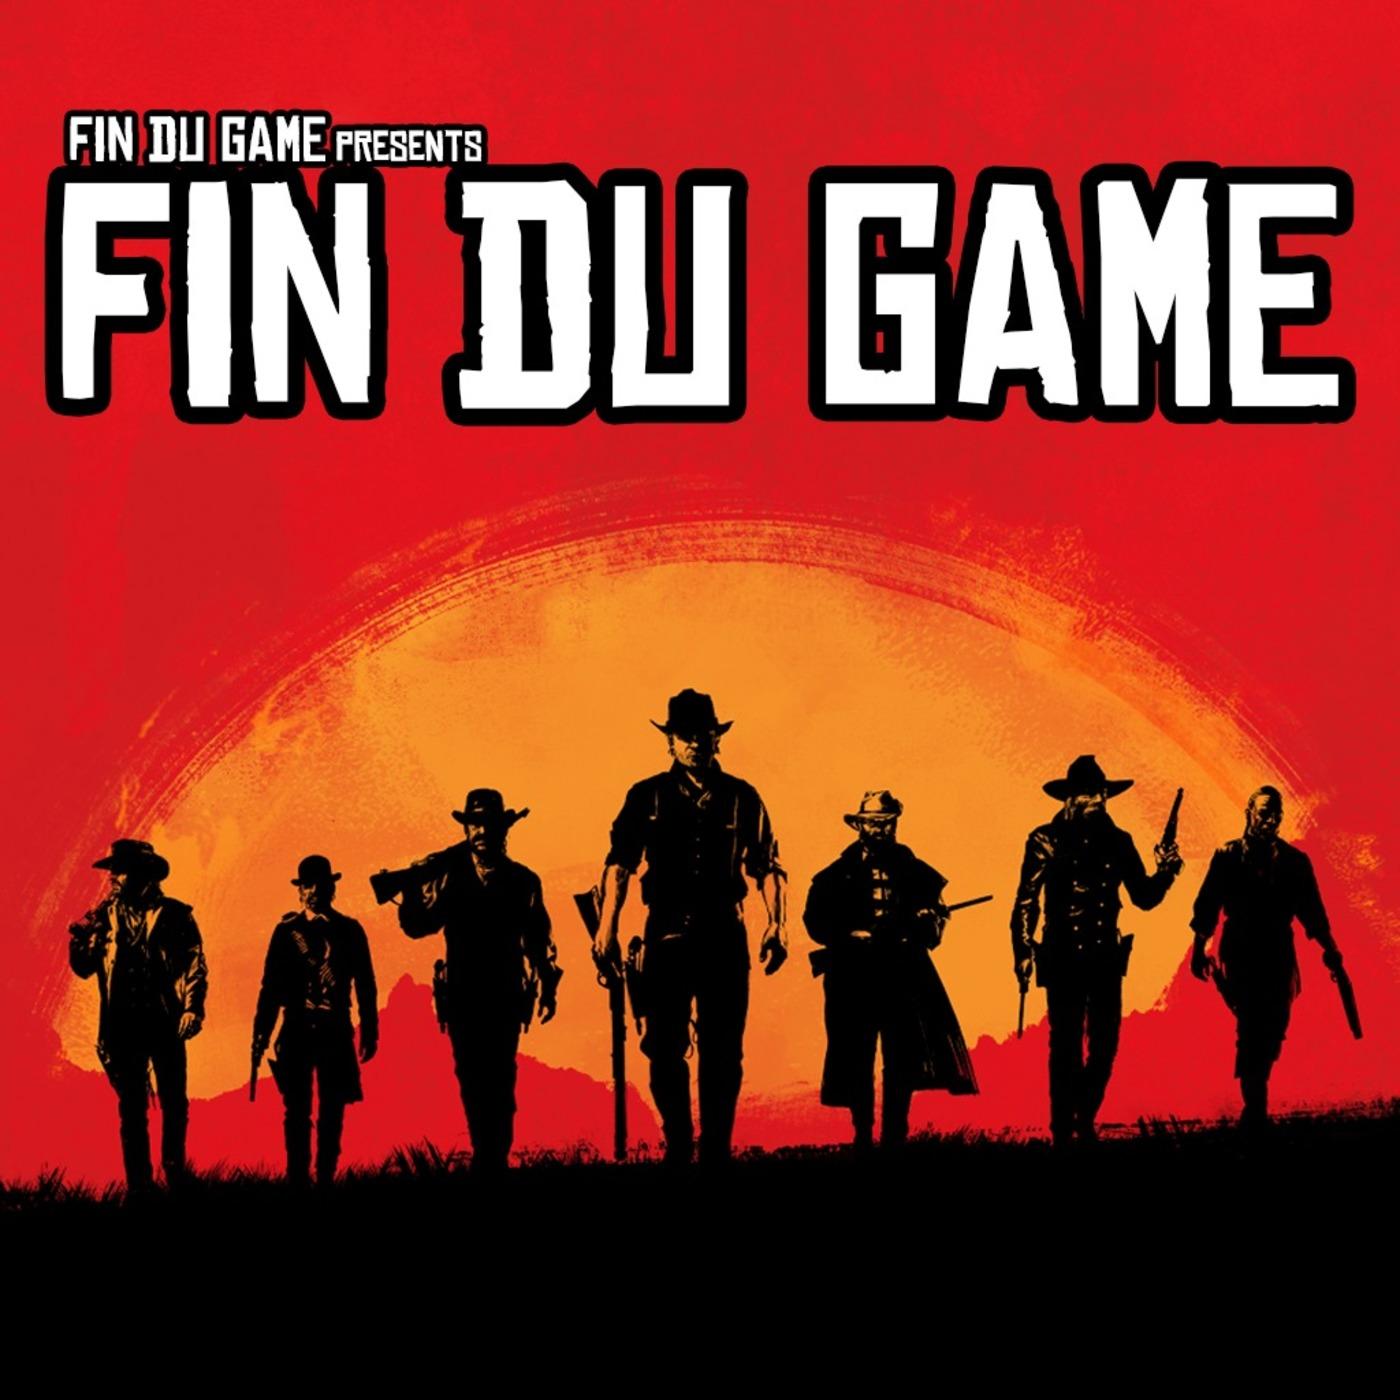 Episode 55 - Red Dead Redemption 2